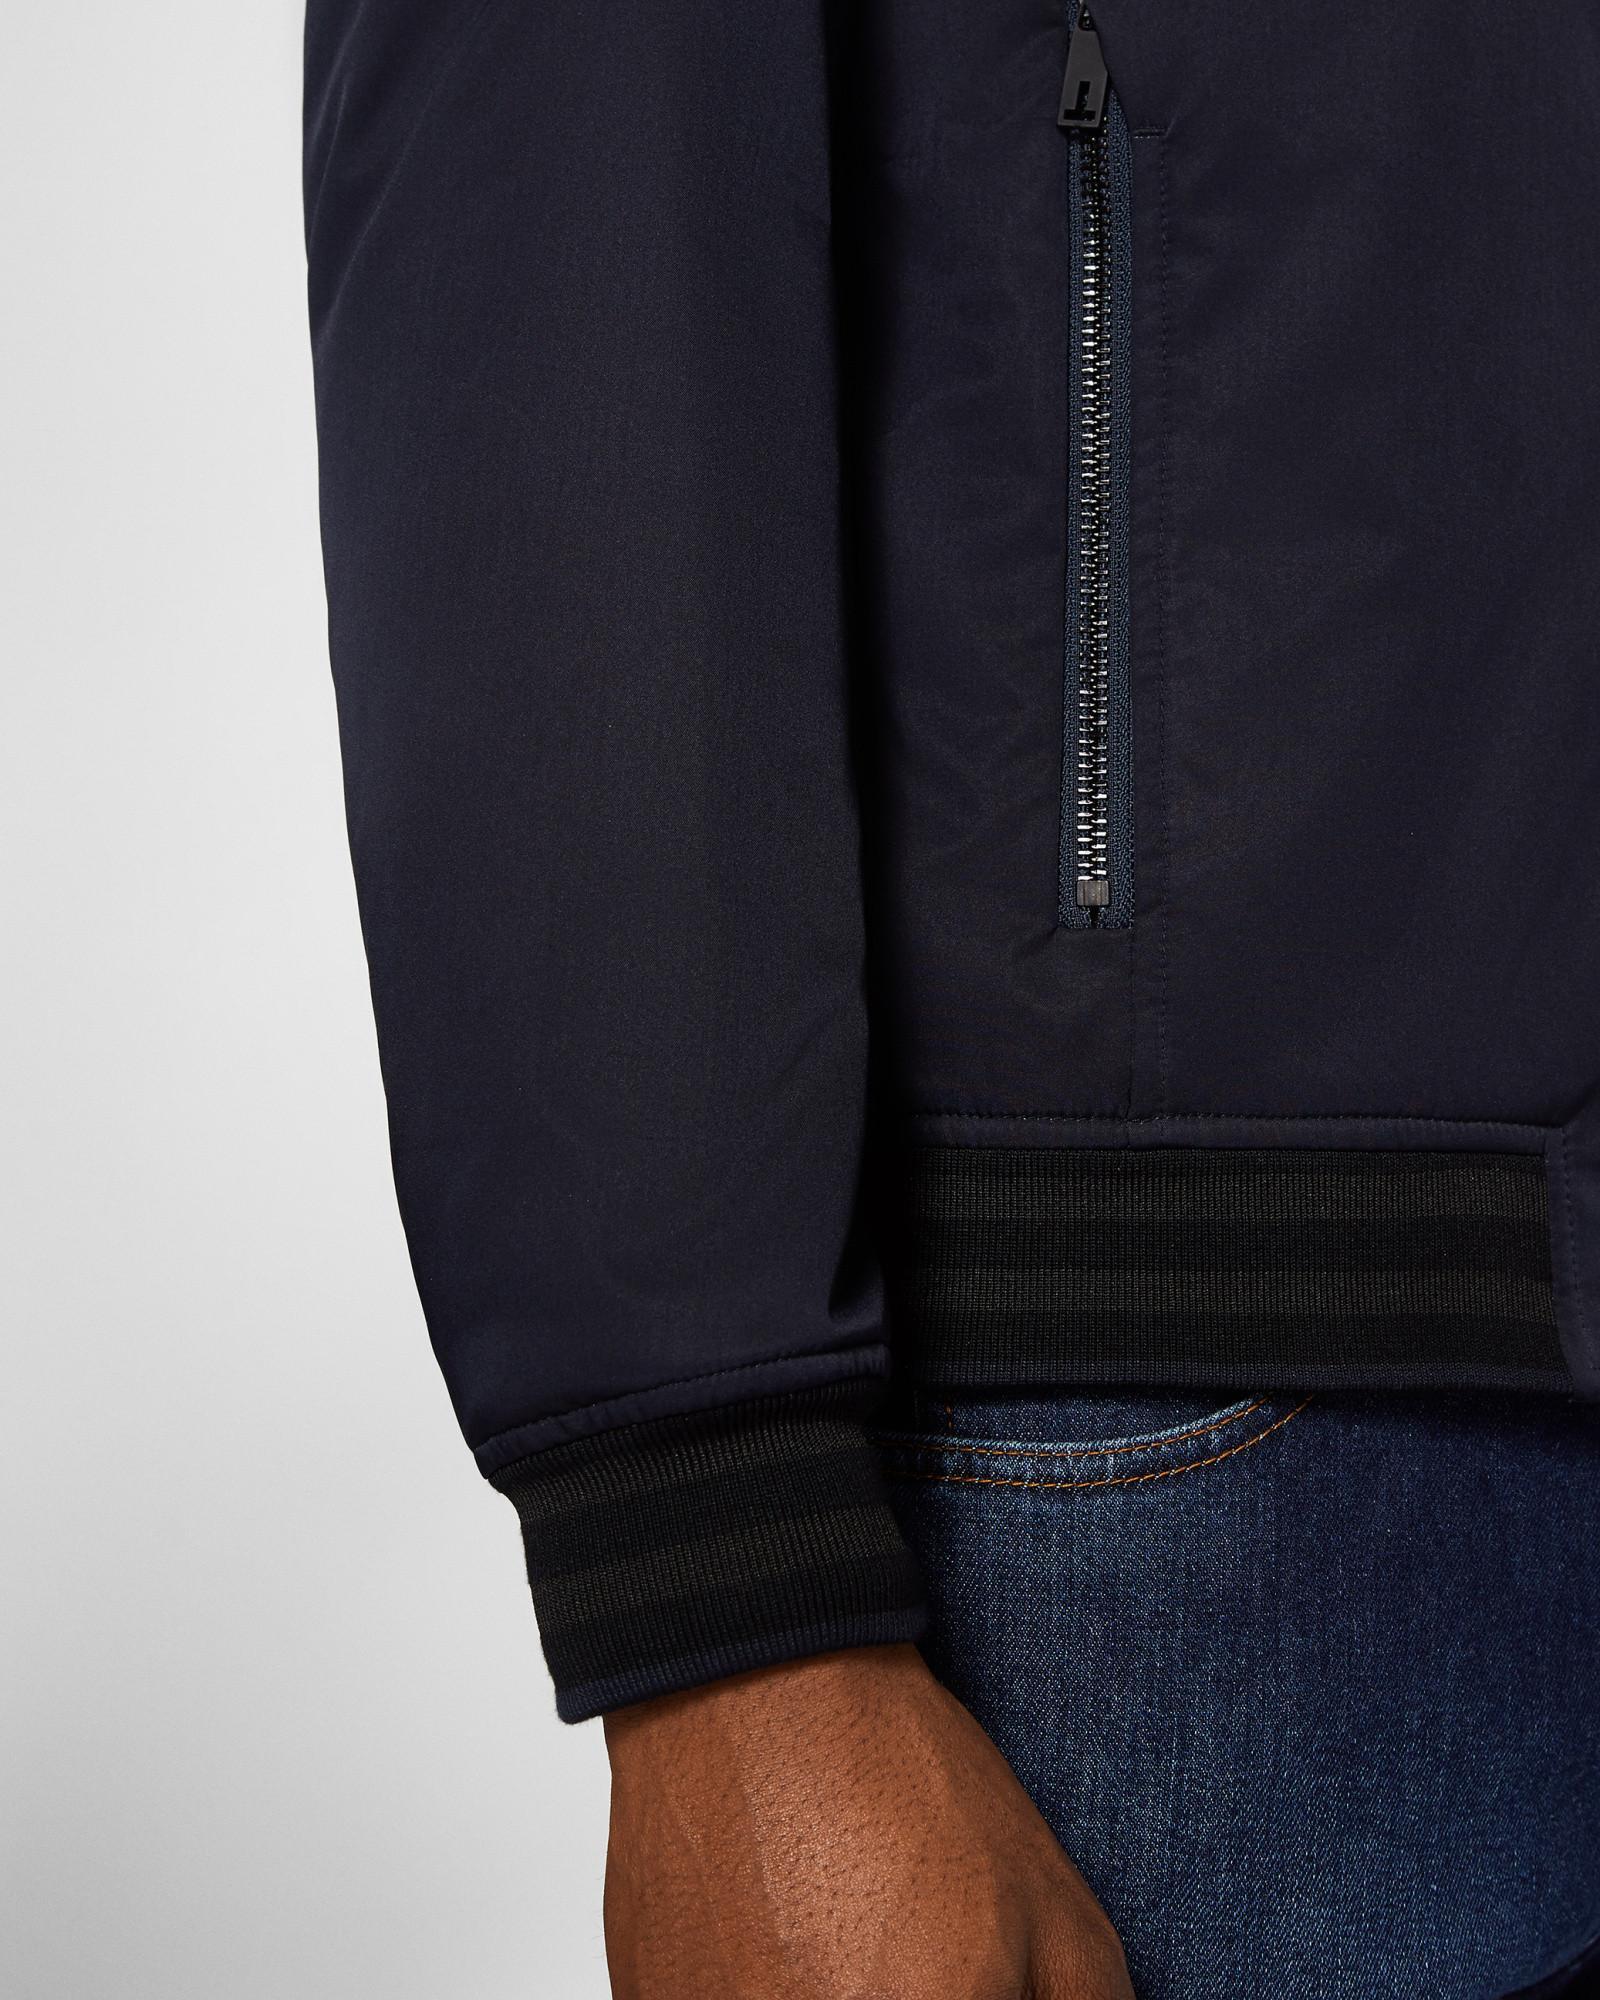 Ted Baker Synthetic Funnel Neck Bomber Jacket in Navy (Blue) for Men